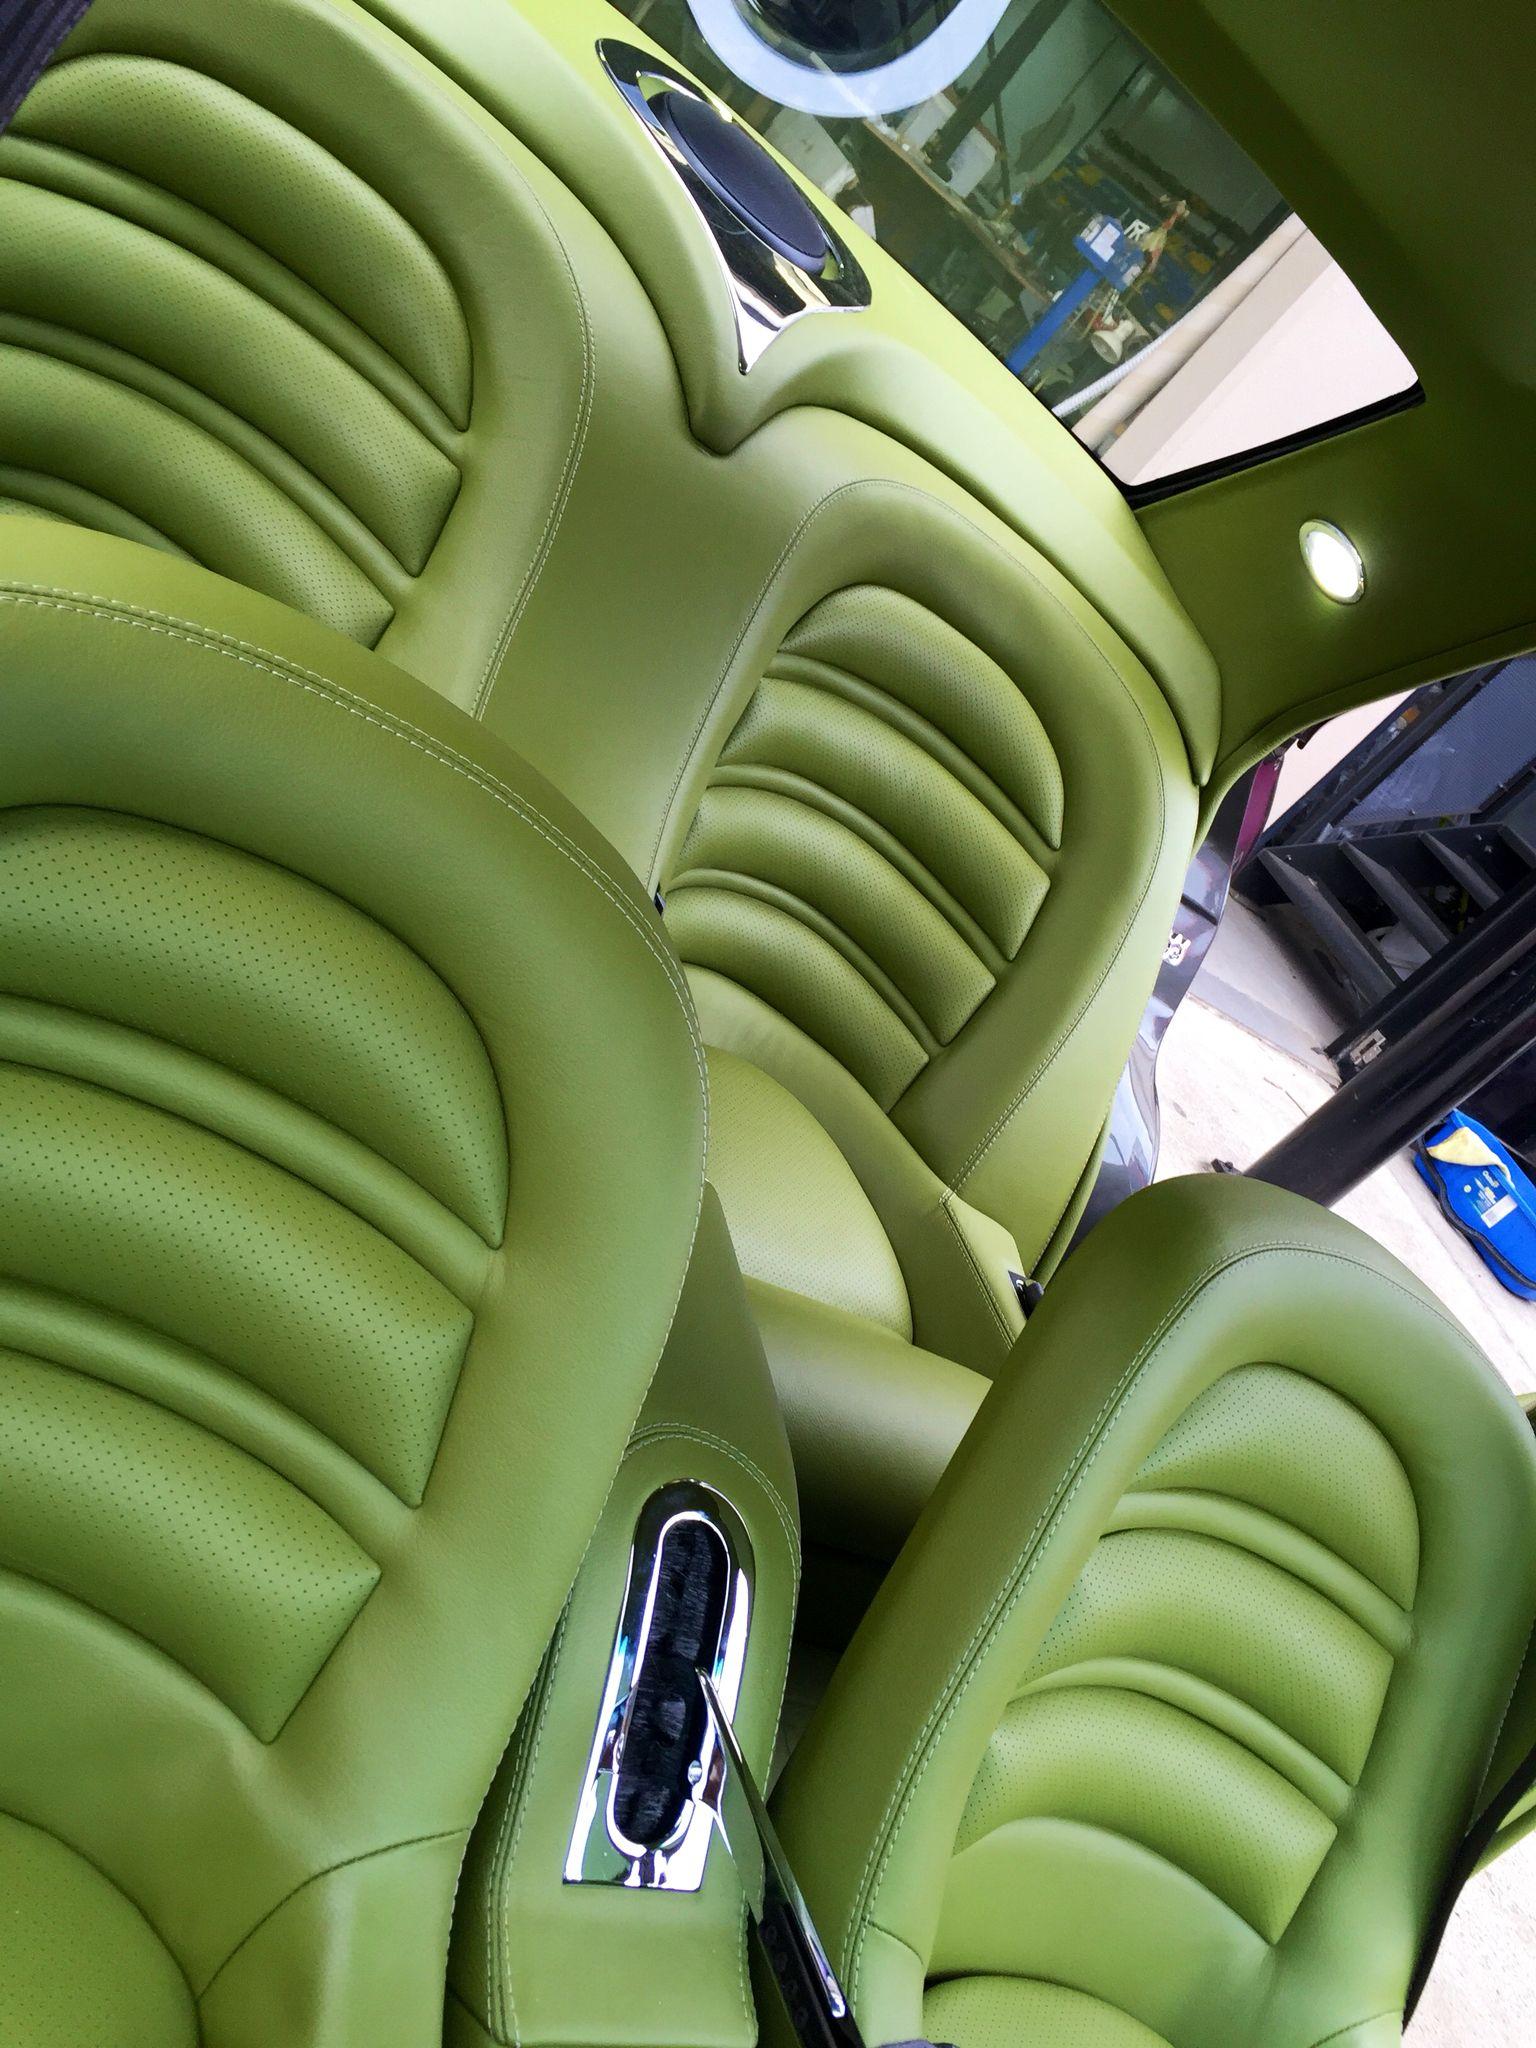 Lowrider Custom Car Interior